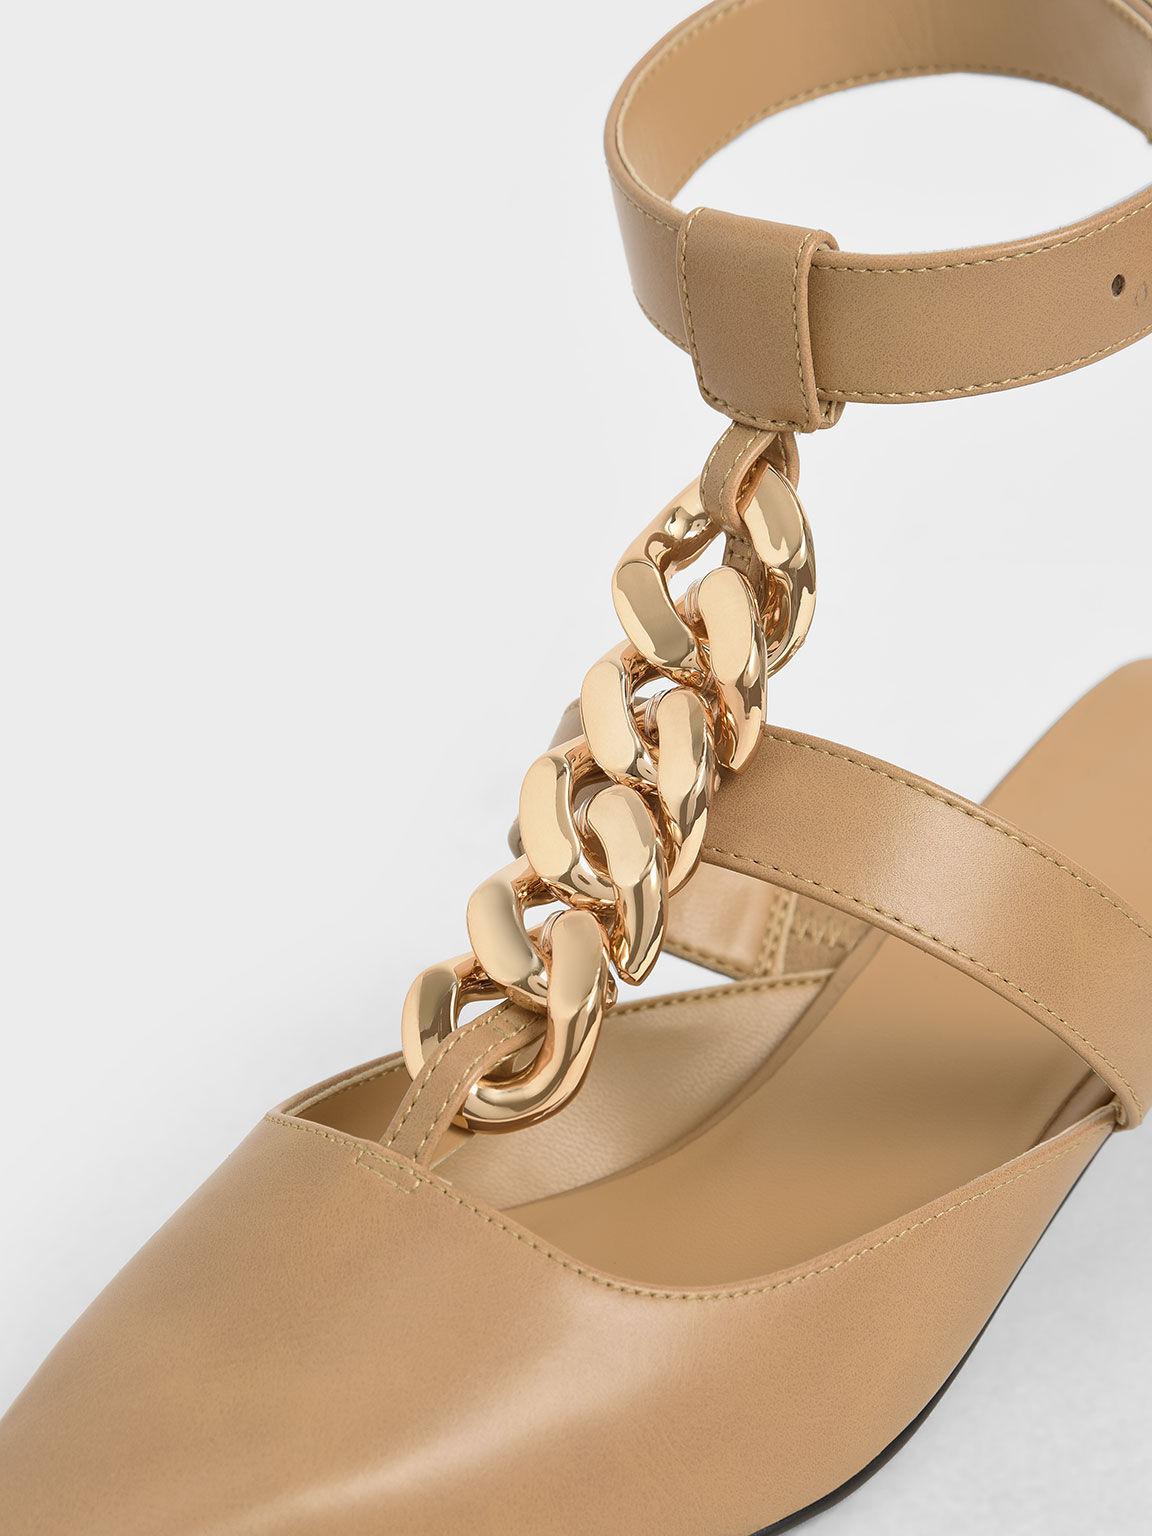 Chain Link Ankle Strap Pumps, Camel, hi-res